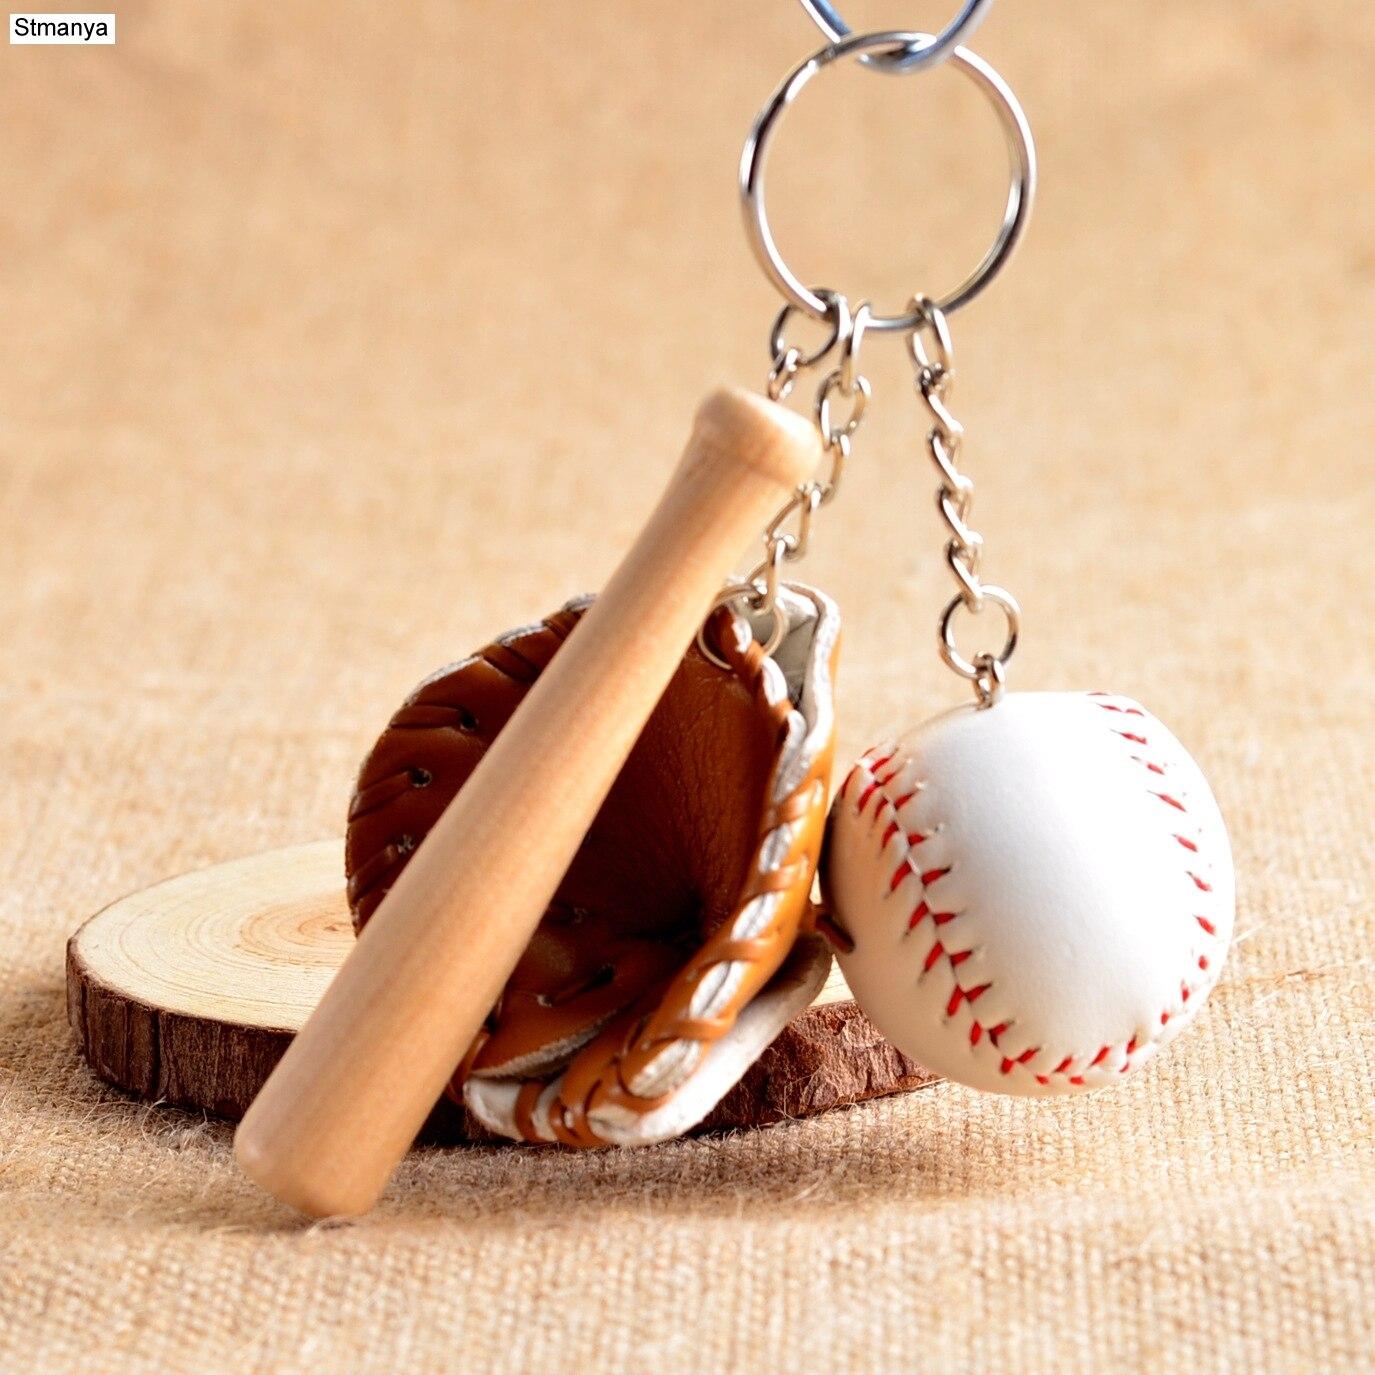 Promotional gift simulation baseball key chain customized logo multiple gifts key chain gift wholesale girl shoes in sri lanka